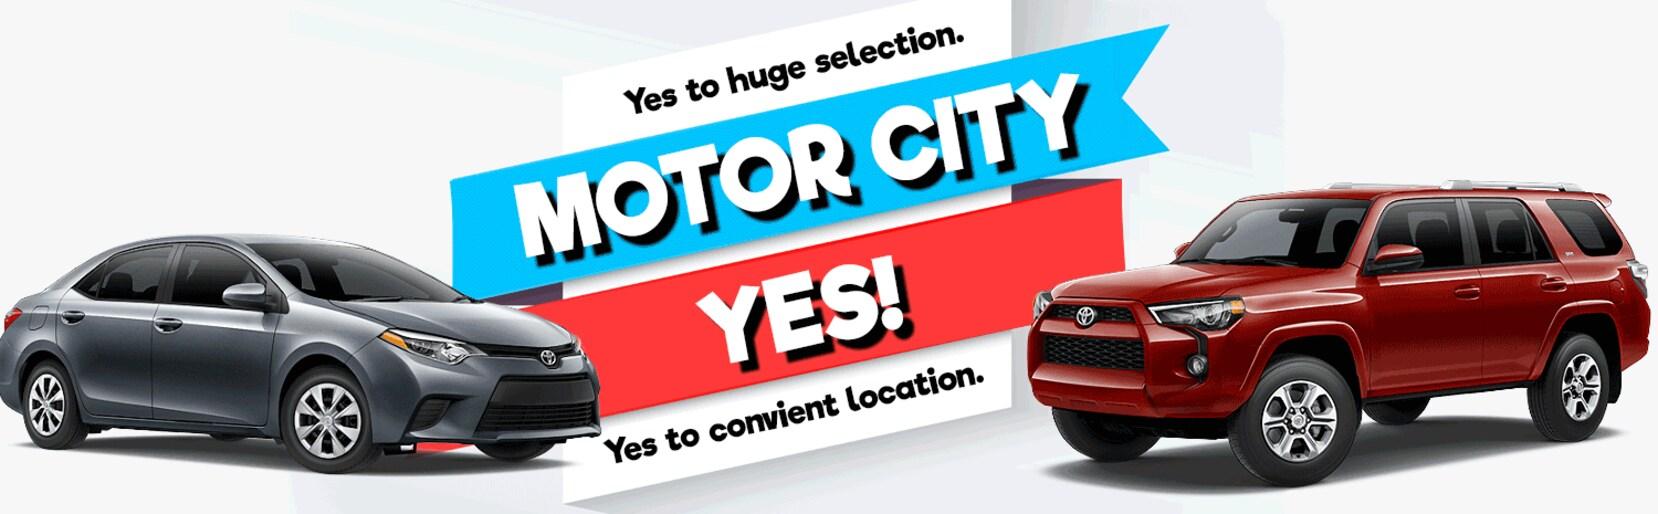 Larry h miller toyota colorado springs toyota car dealer for Toyota motor city colorado springs